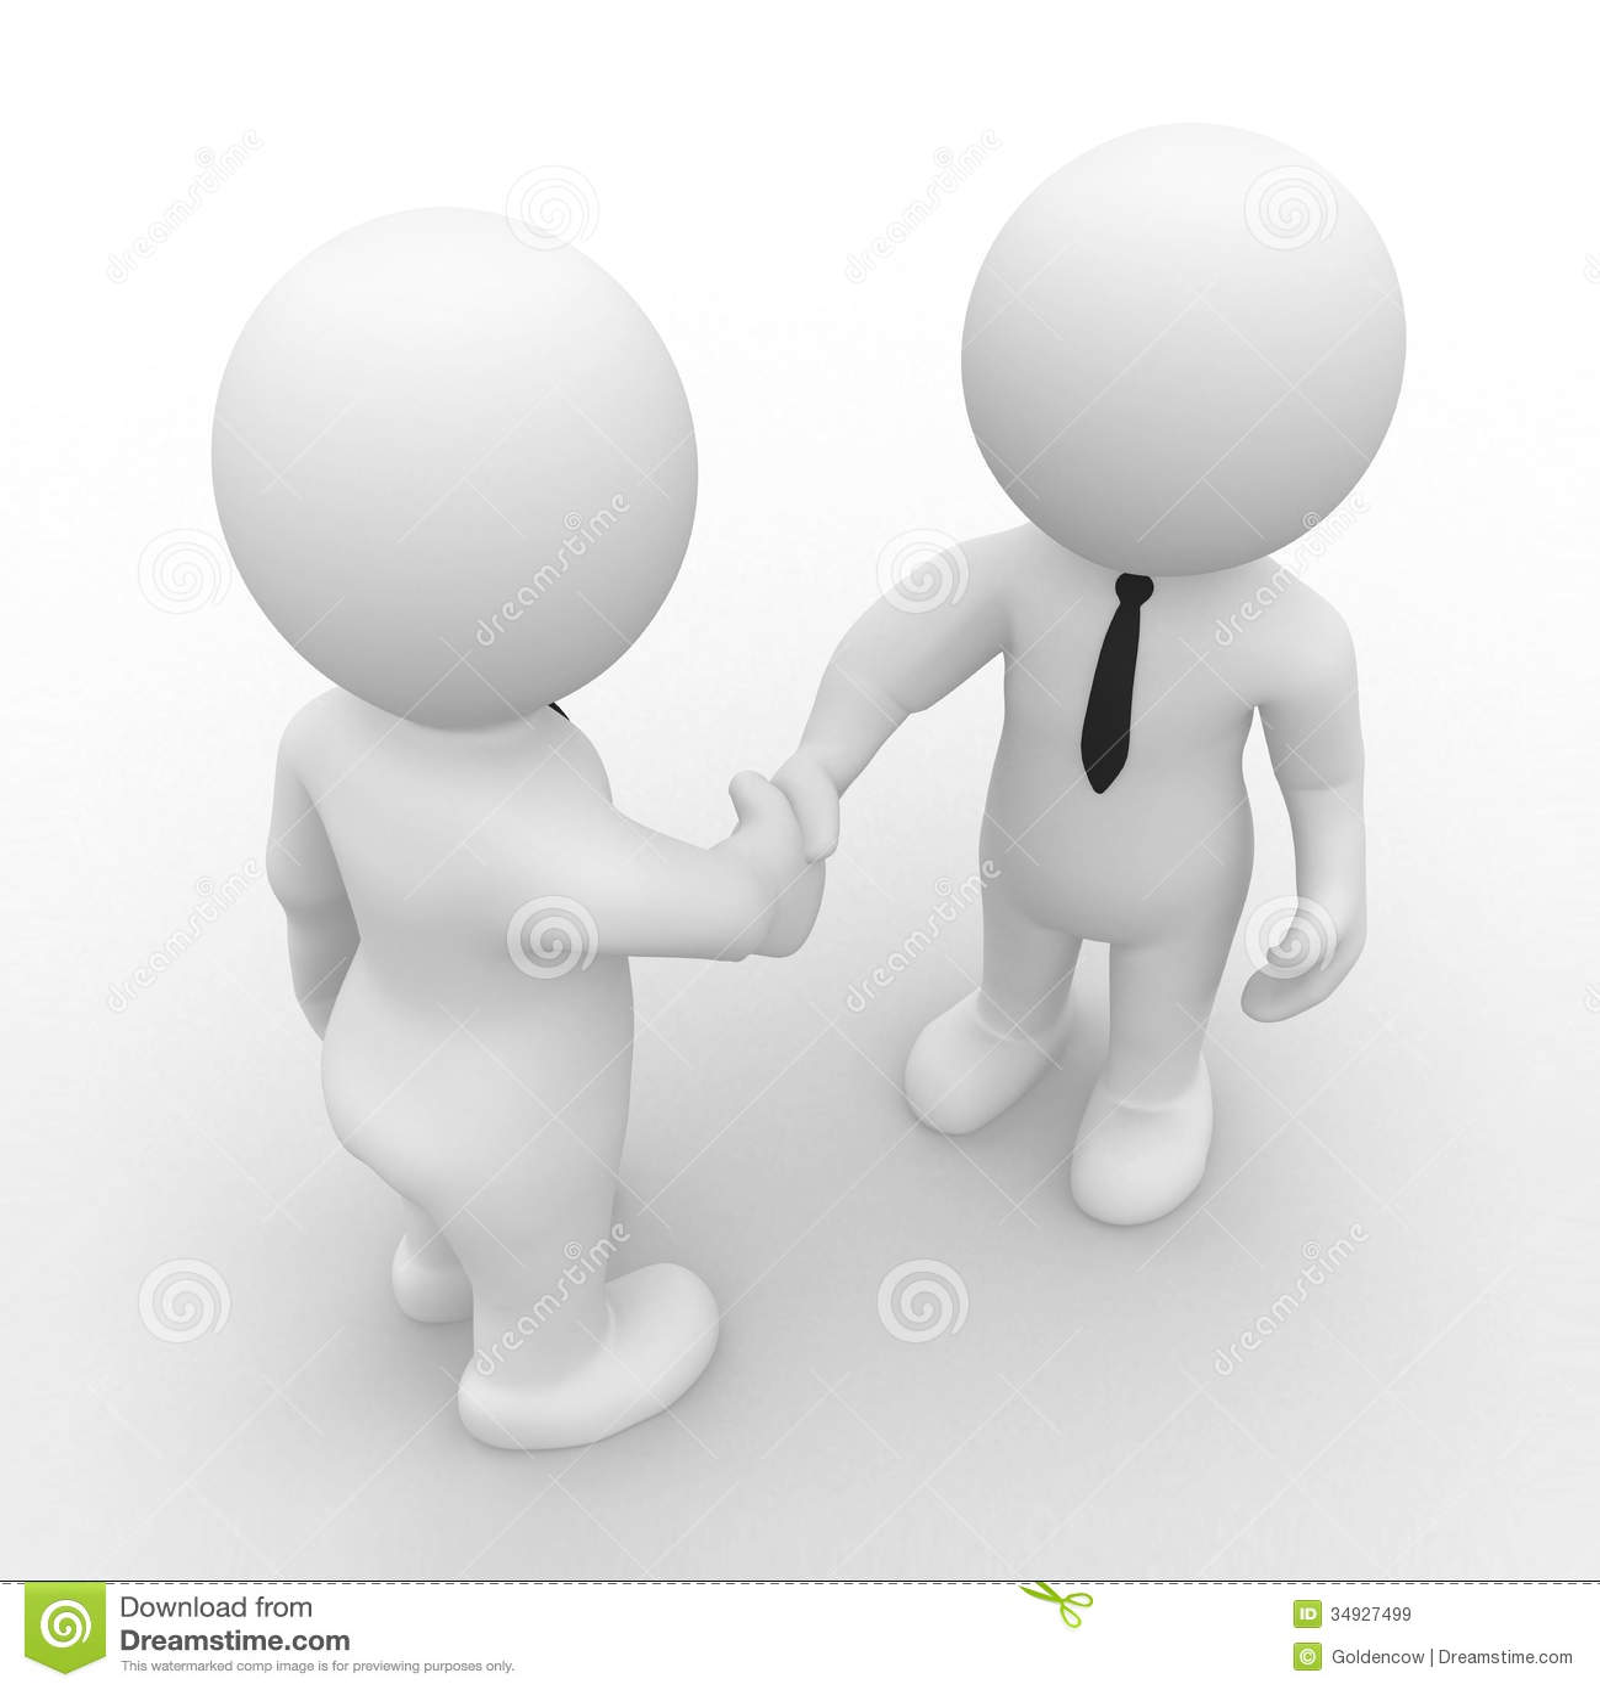 handshake in business royalty free stock images image handshake clipart common handshake clipart black & white man